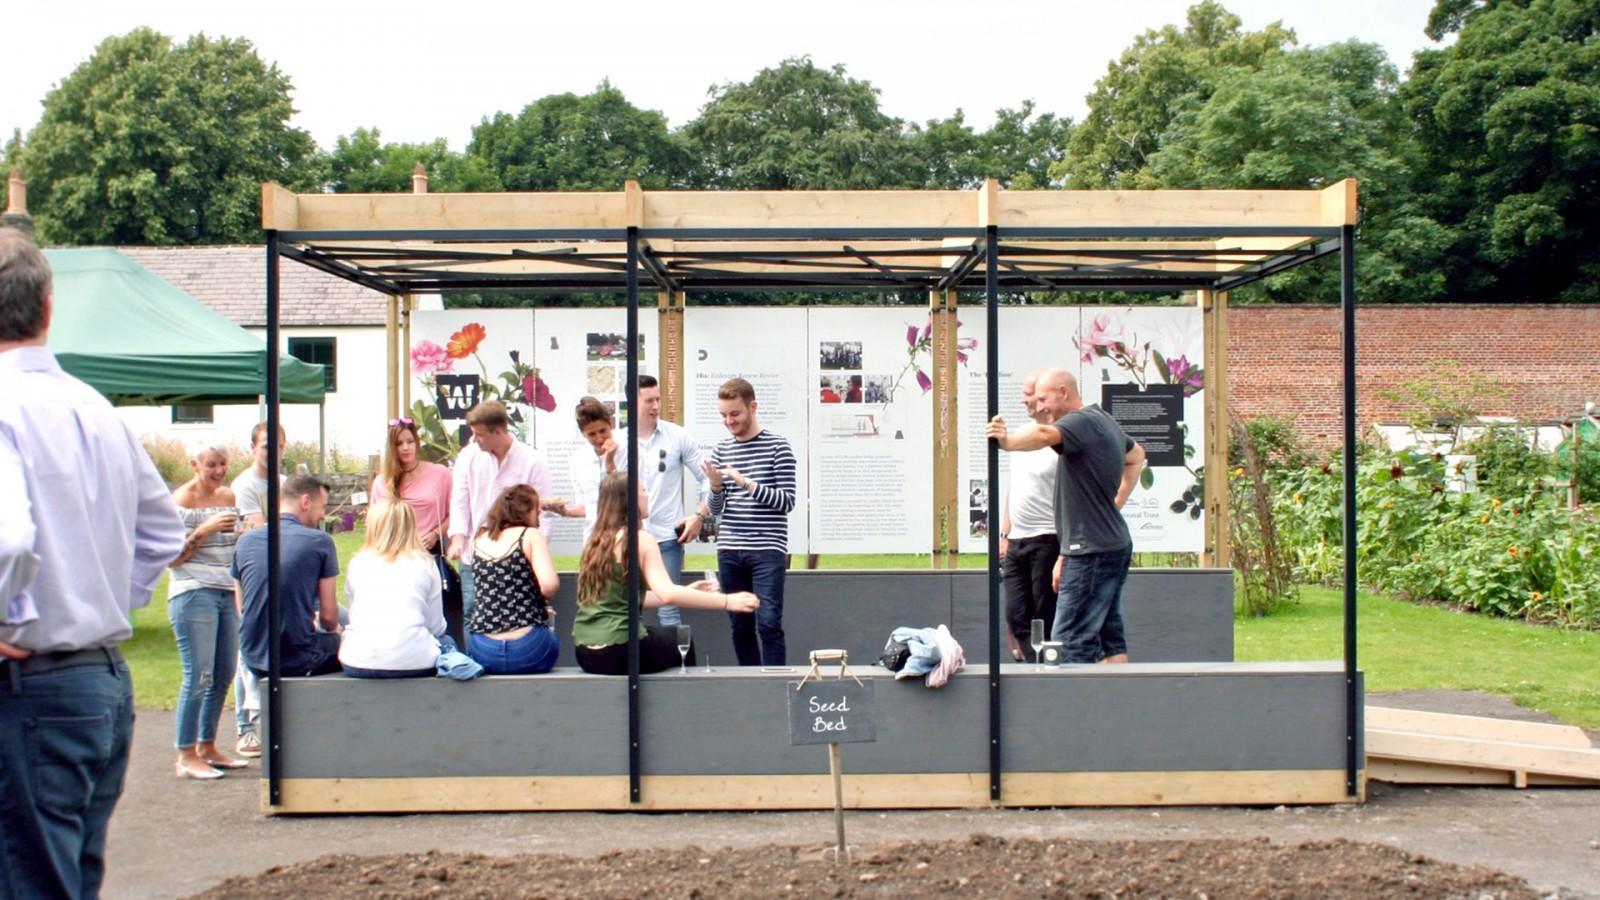 gibside pavillion 1 -  image for Gibside National Trust – Walled Garden project